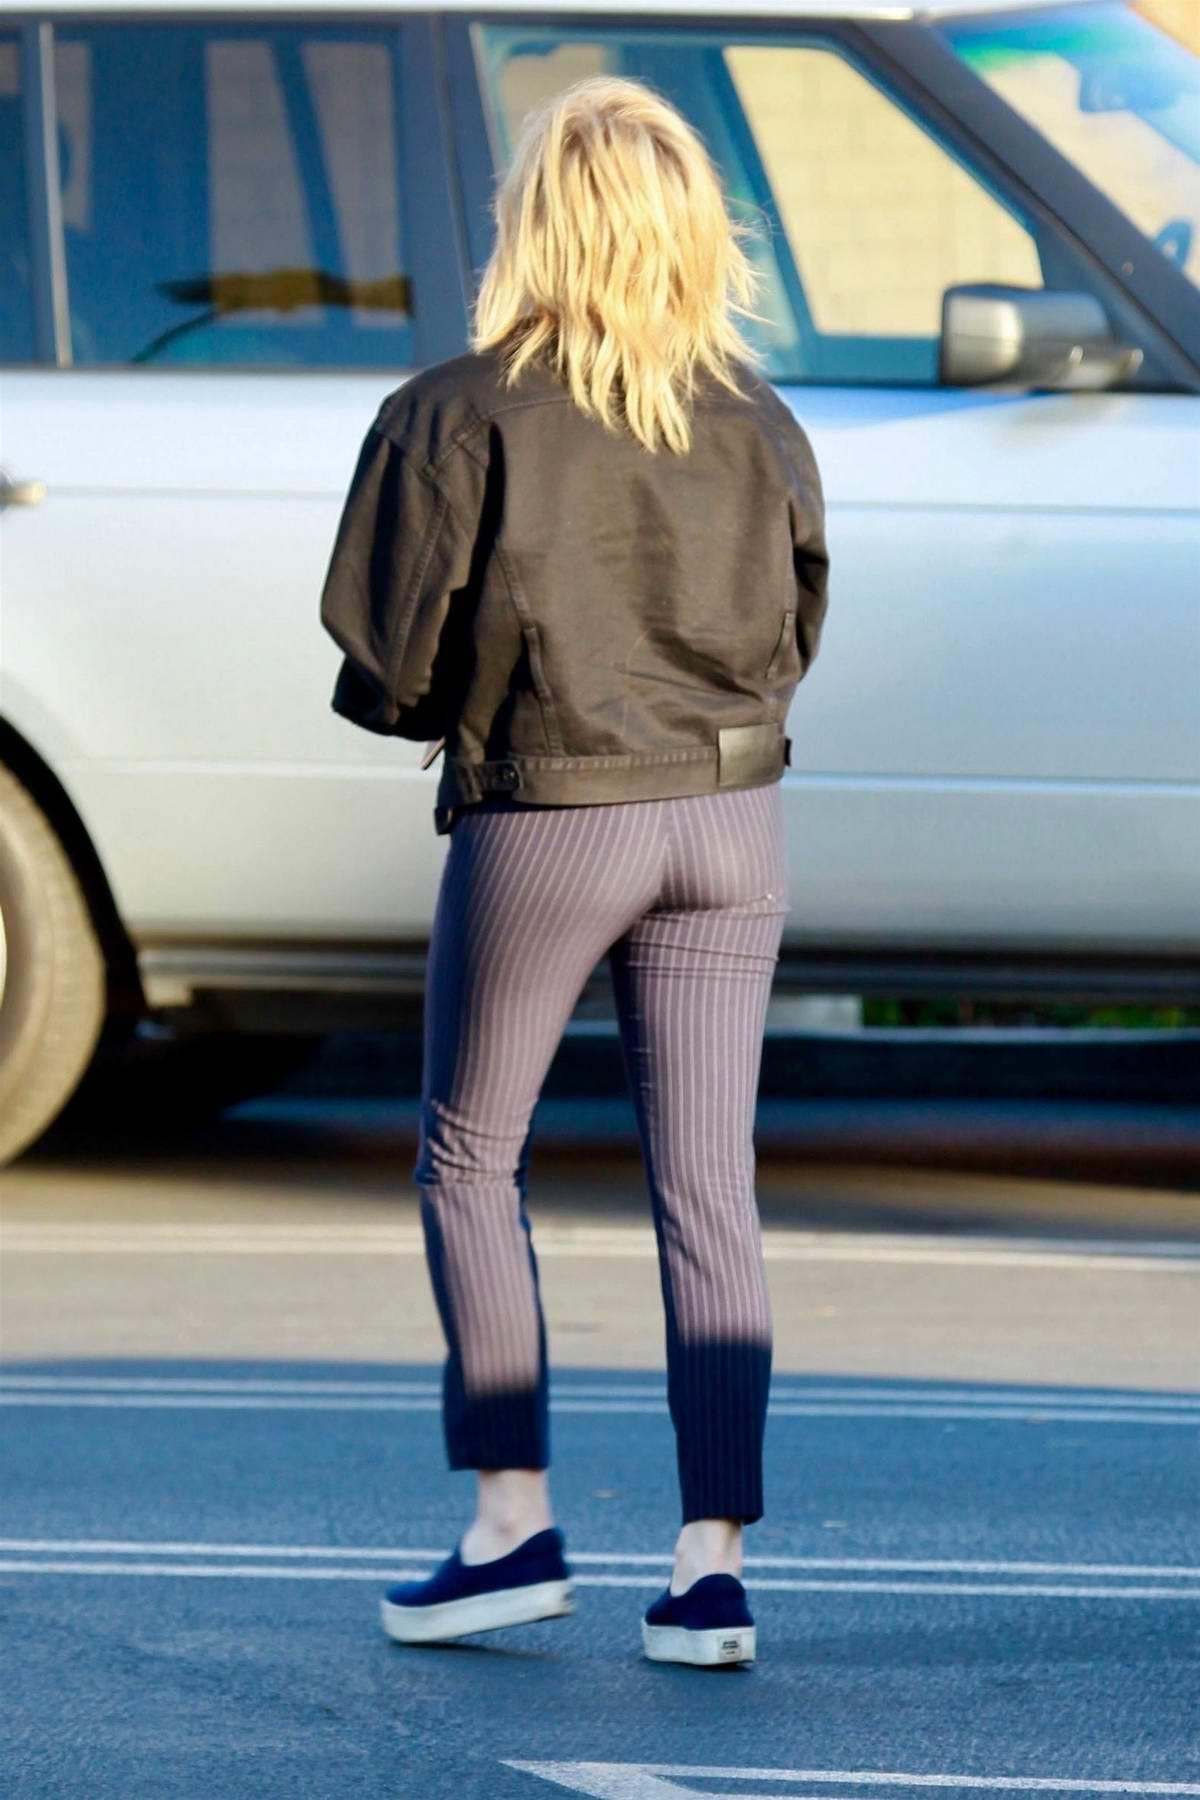 Chloe Moretz Booty In Tights